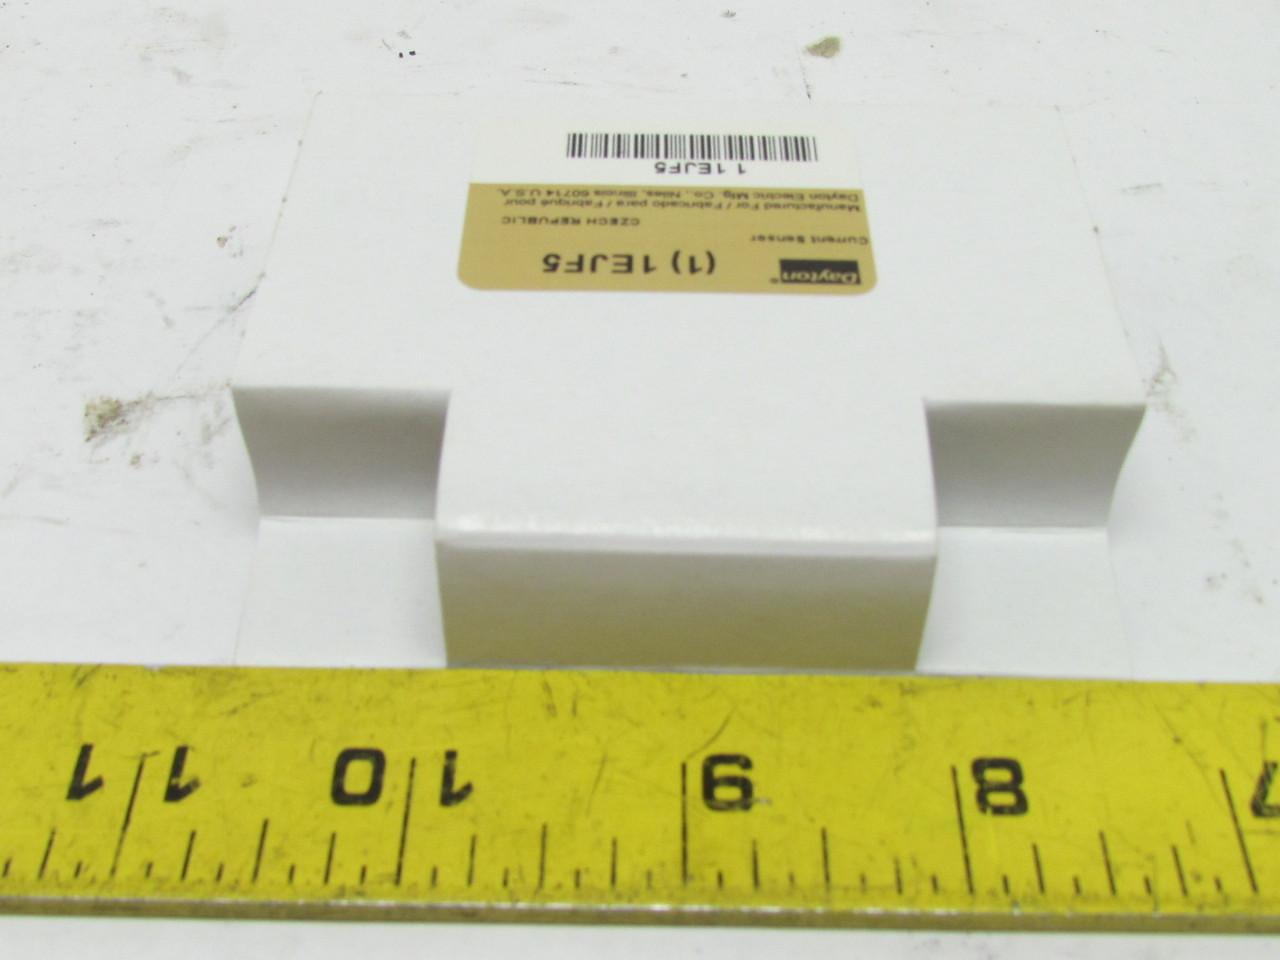 Dayton 1EJF5 Current Sensing Relay 5 Amp 24-240VAC DIN